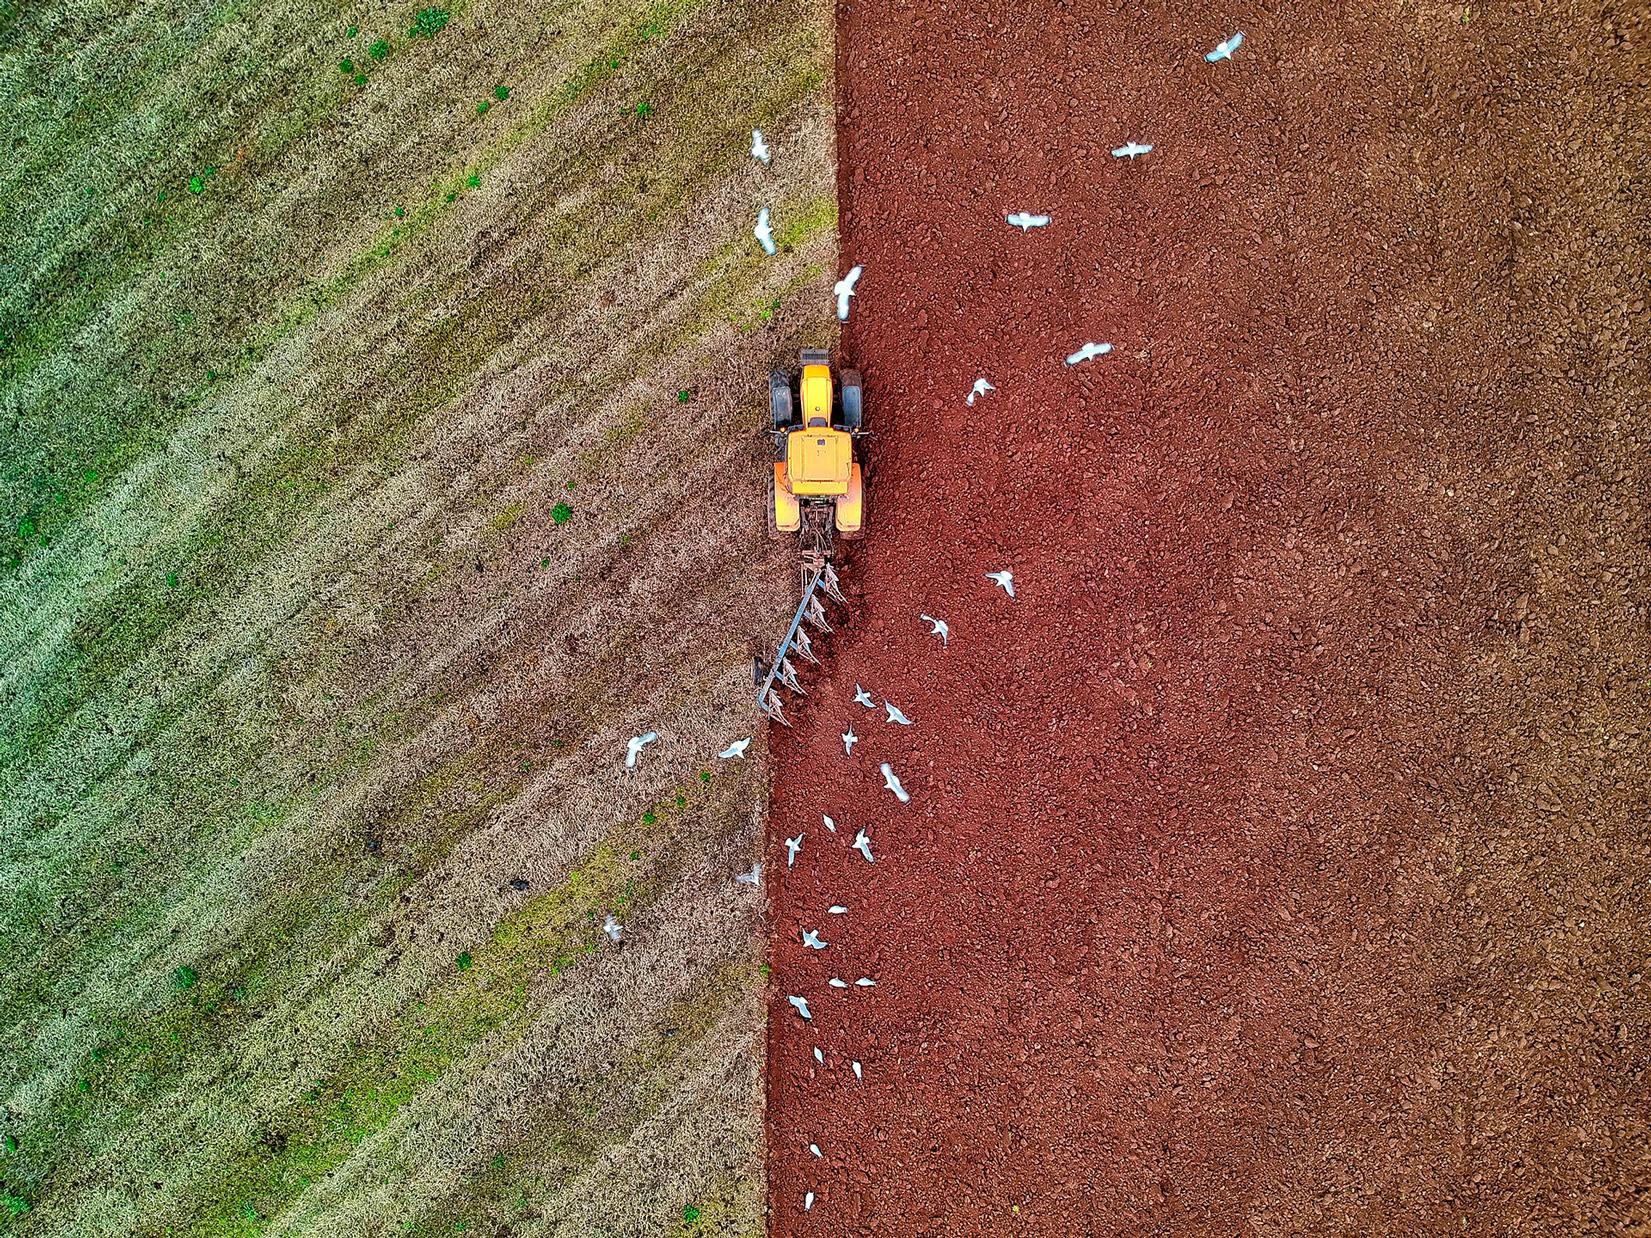 RZ-Flock-Of-Seagulls-sml.jpg